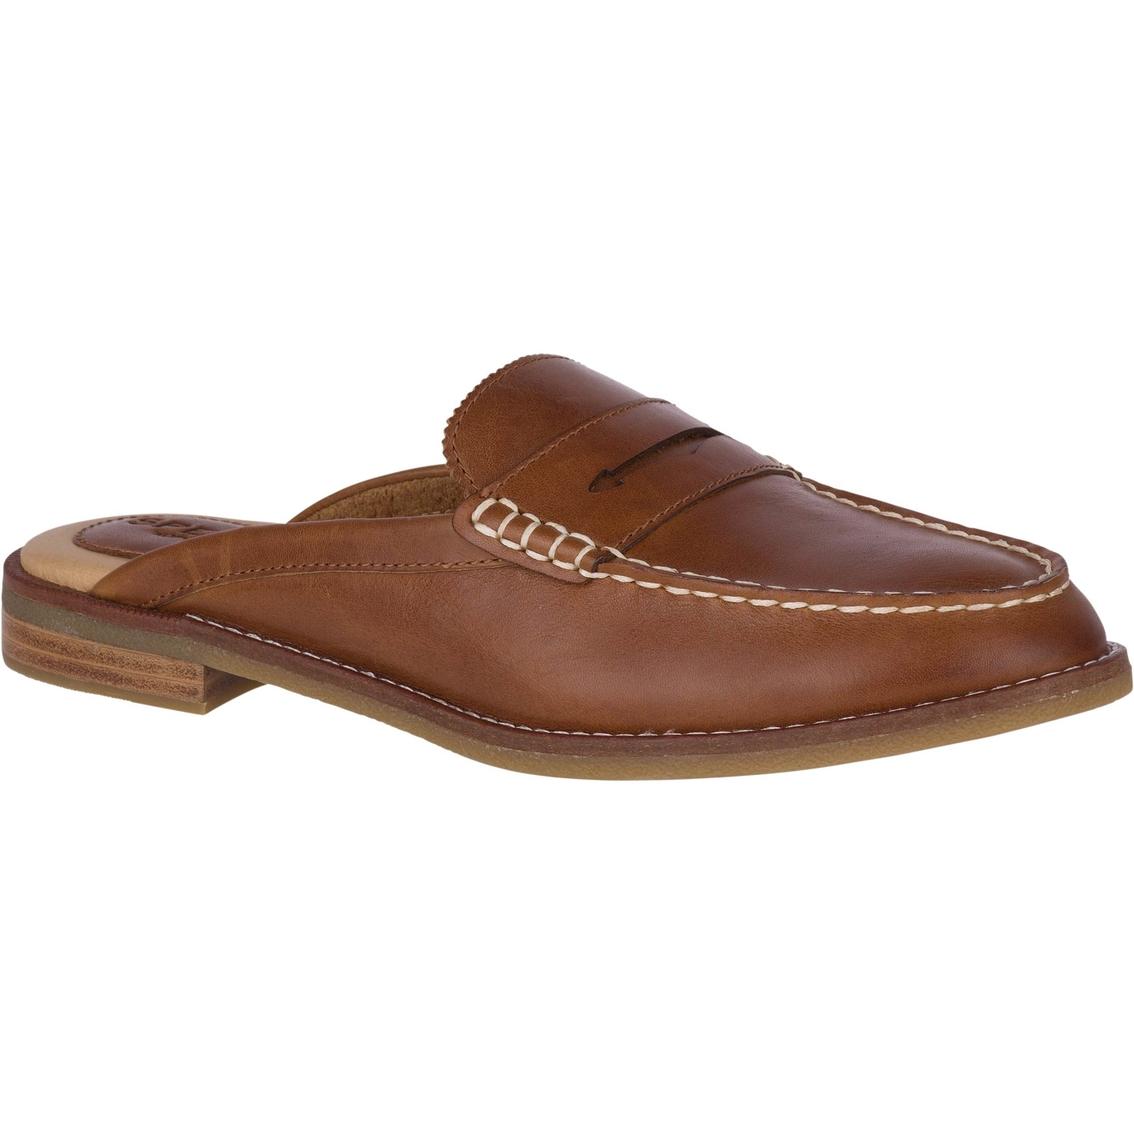 Seaport Fina Penny Mule | Flats | Shoes